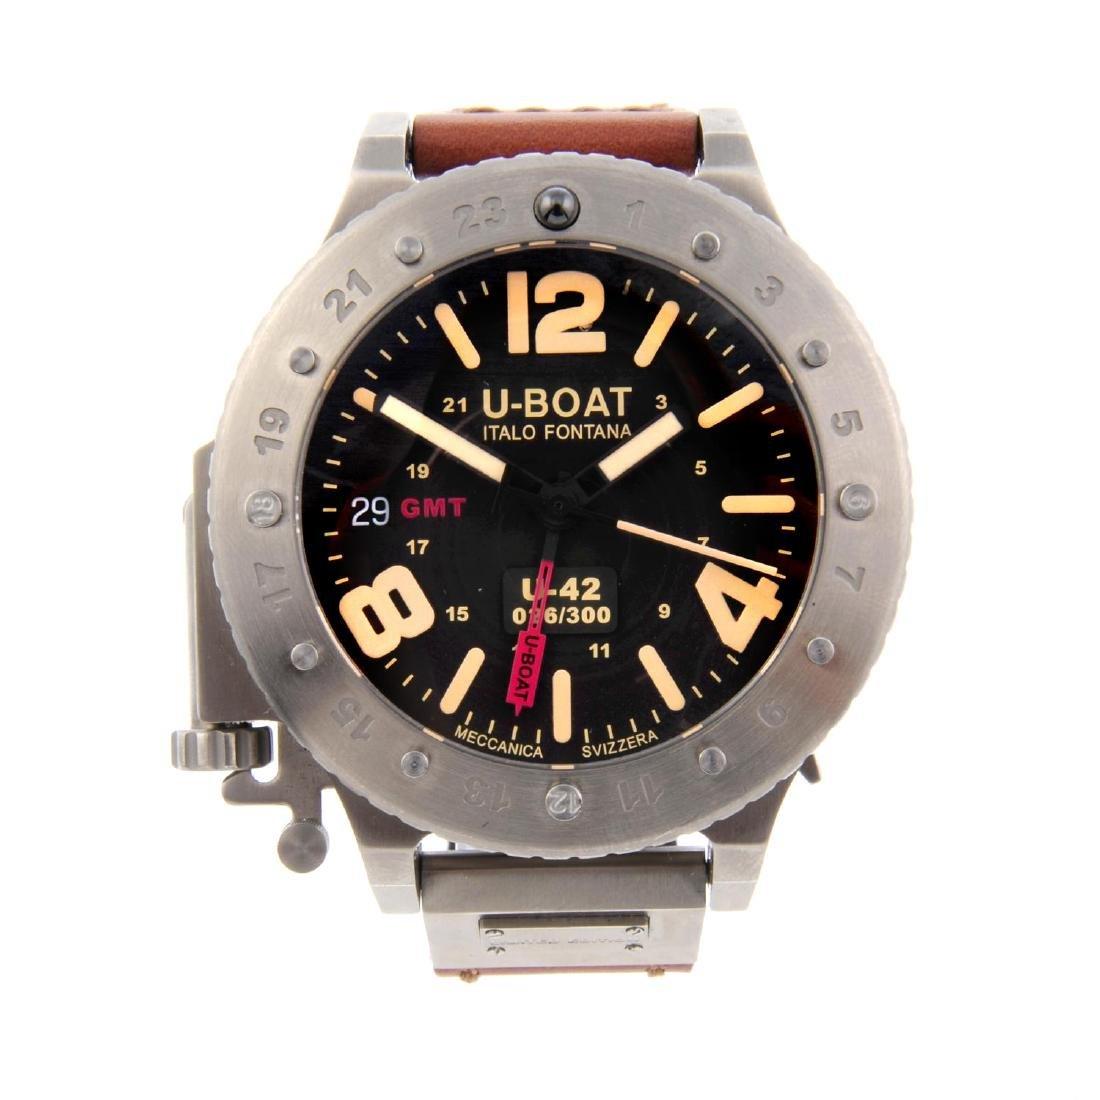 U-BOAT - a limited edition gentleman's Italo Fontana